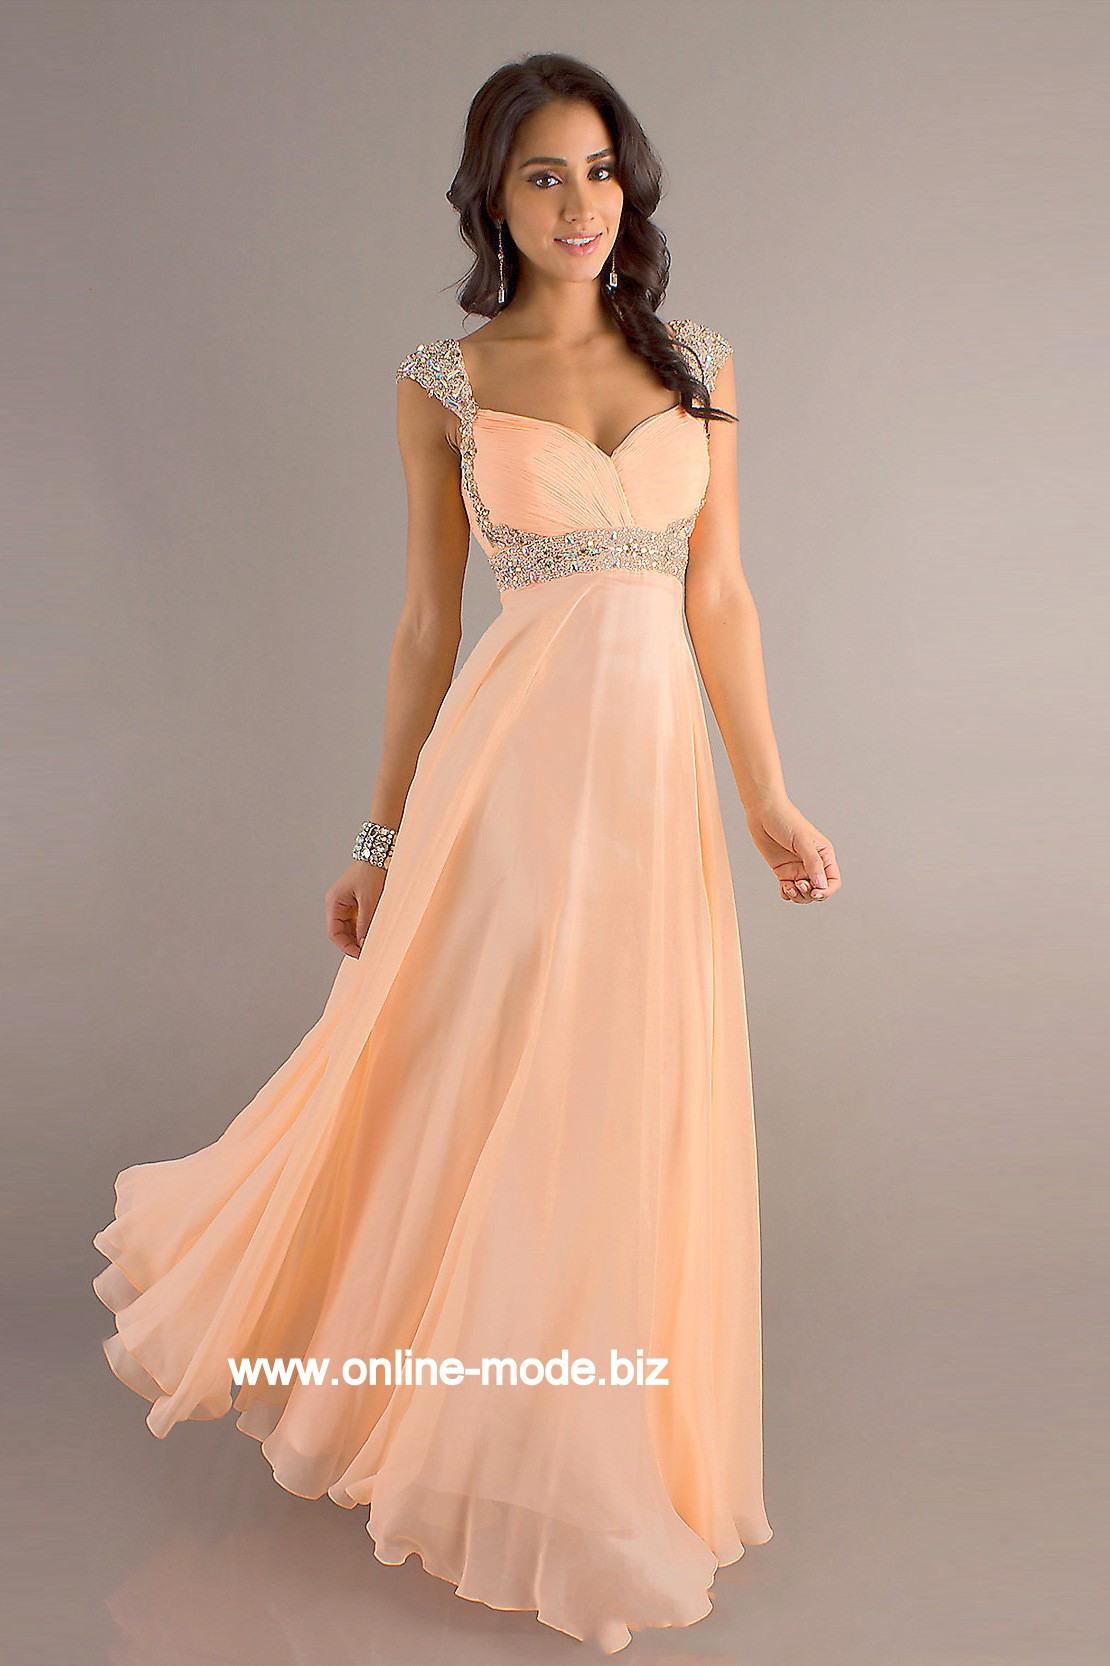 Damen Kleid Abendkleid In Aprikose